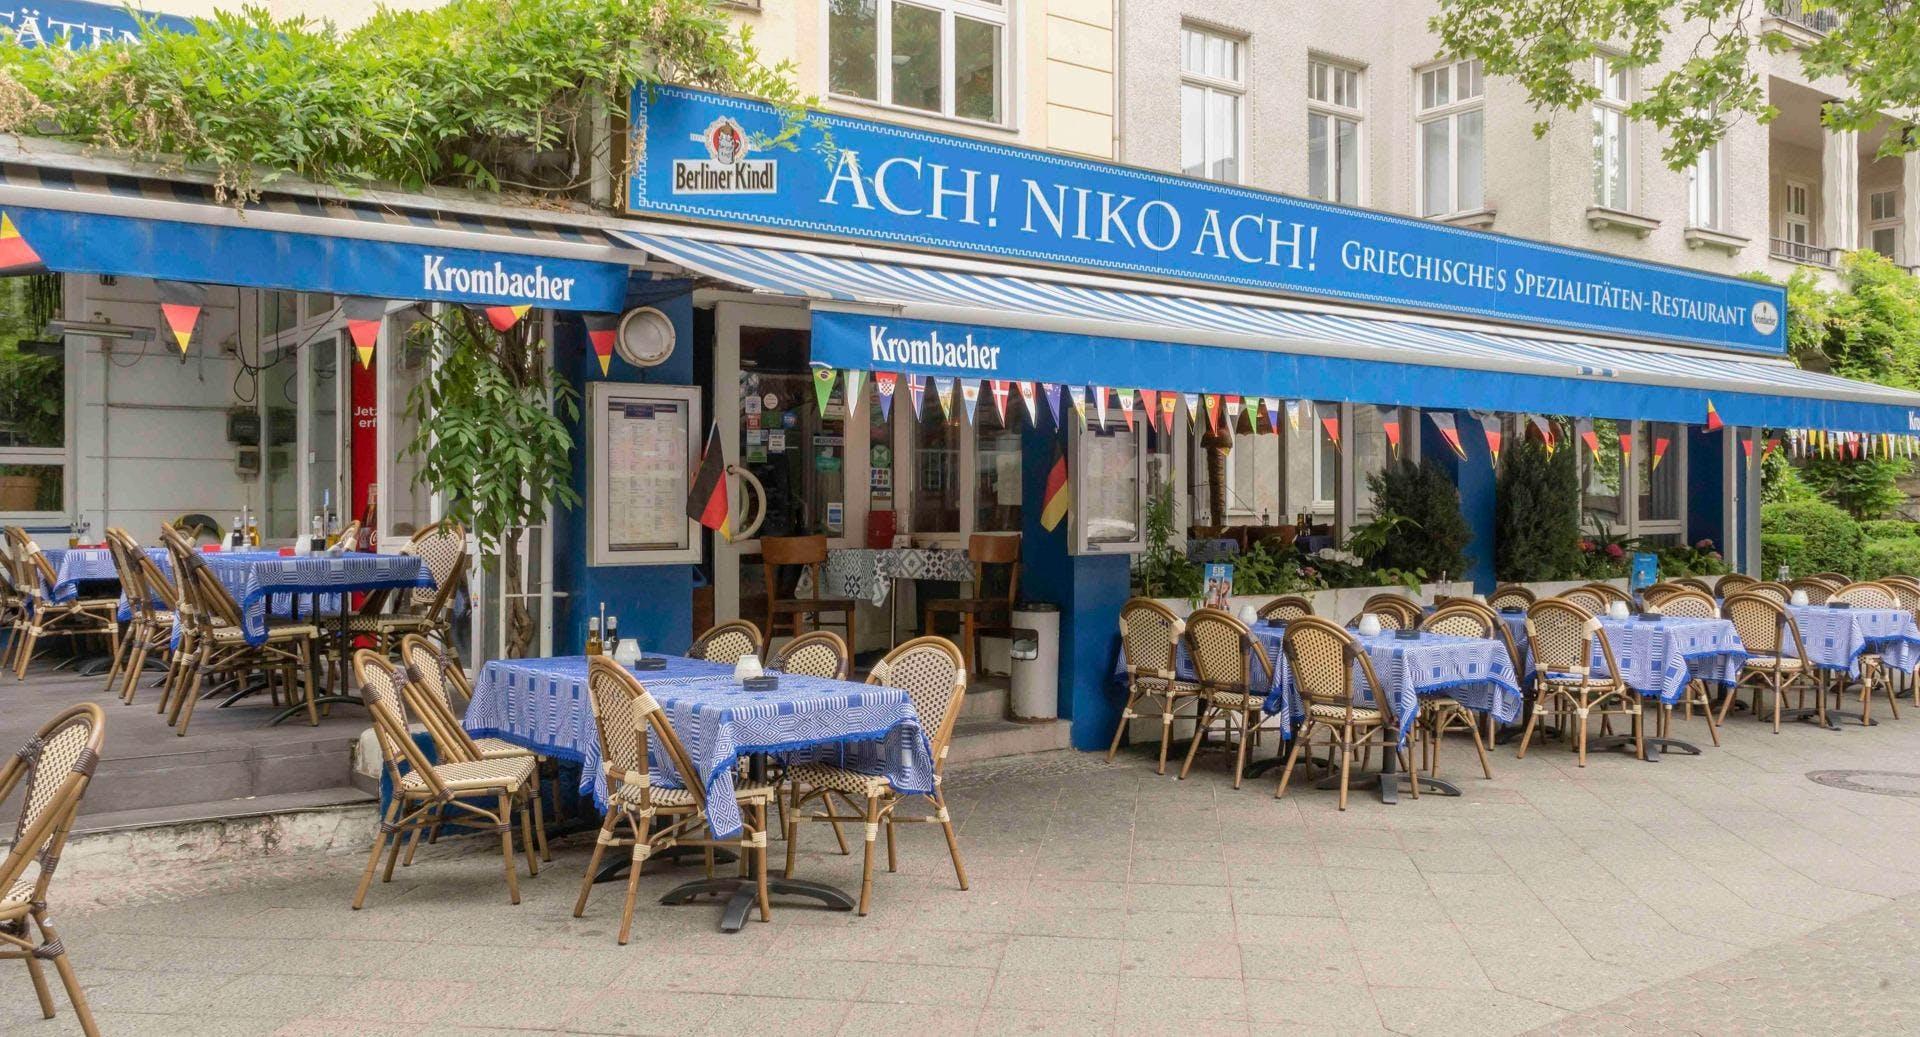 Ach Niko Ach Berlin image 1